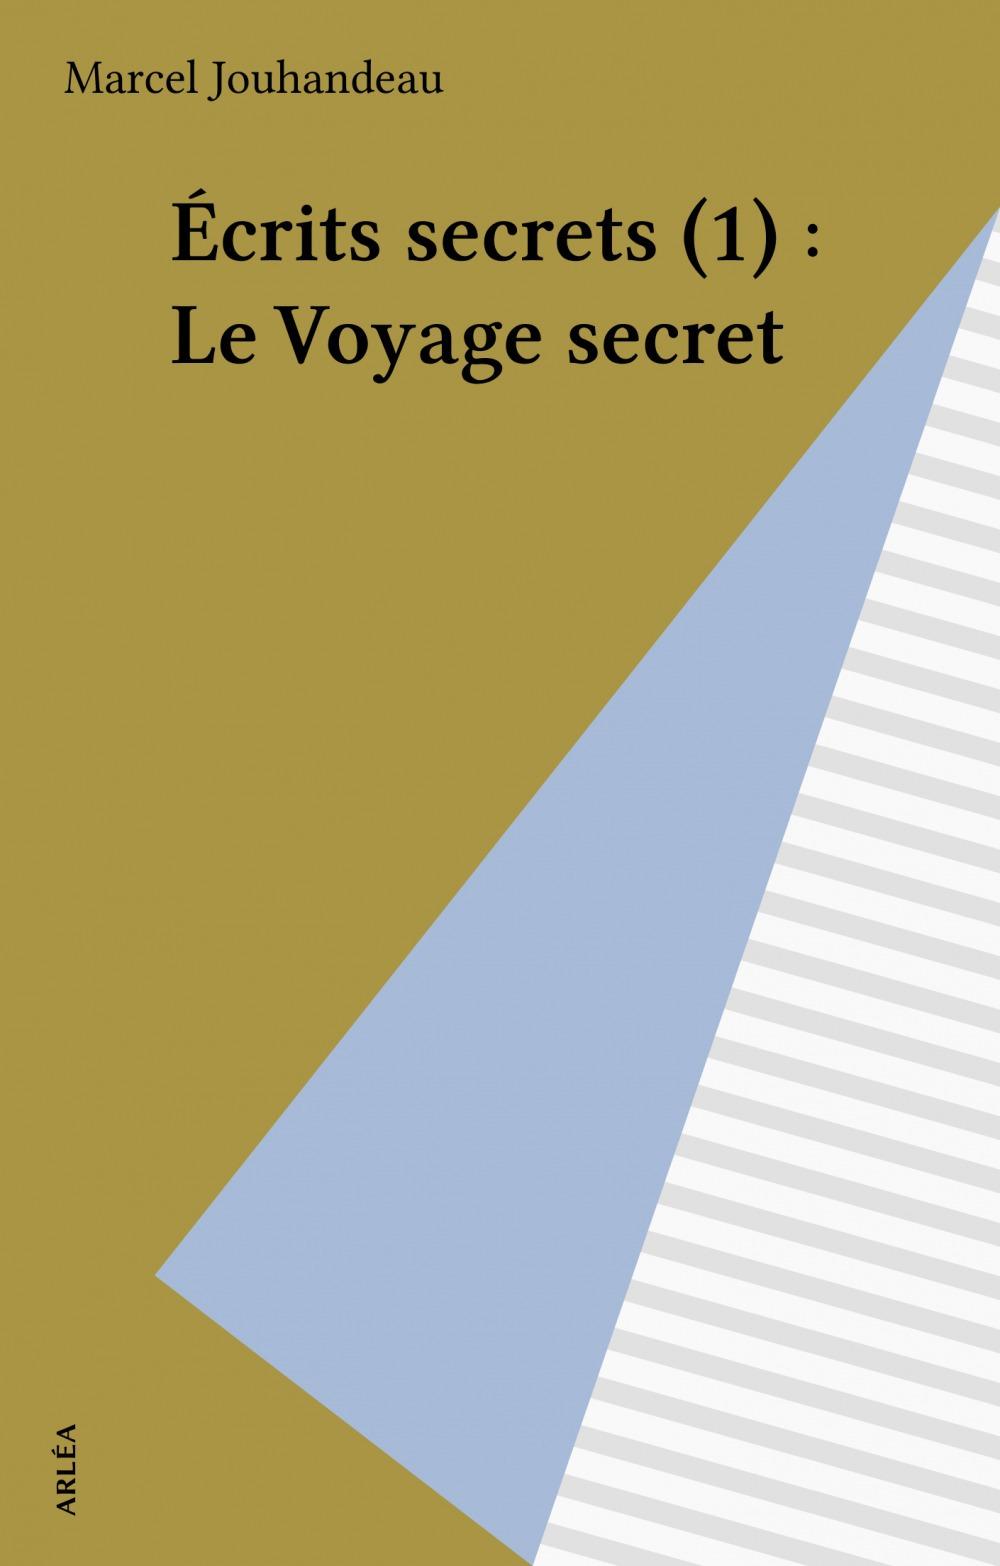 Voyage secret